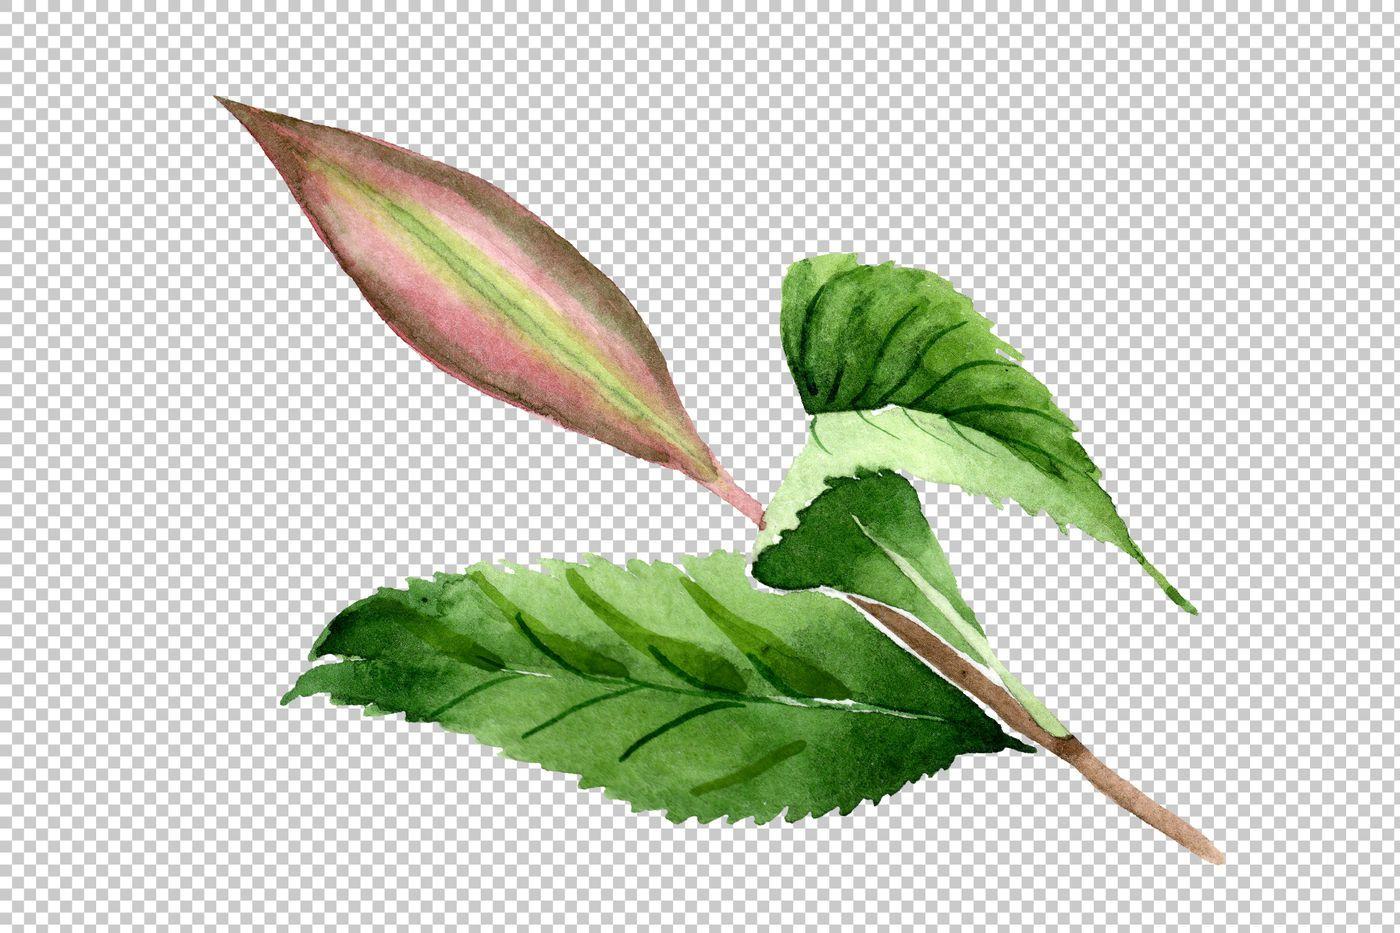 Tea Leaf Png Watercolor Set By Mystocks Thehungryjpeg Com Png Aff Leaf Tea Watercolor Adver Plant Leaves Floral Botanical Botanical Gardens